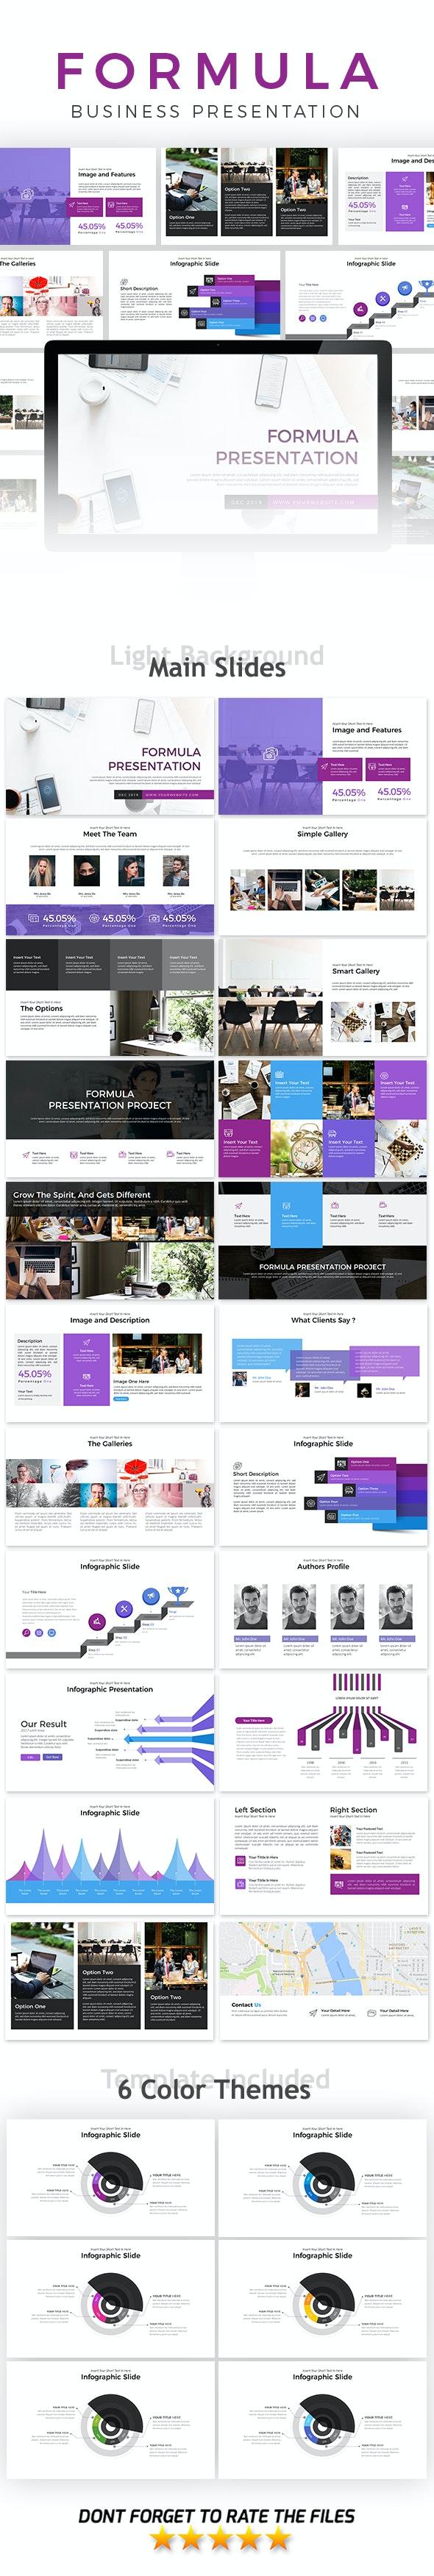 Formula Powerpoint Template - Business PowerPoint Templates